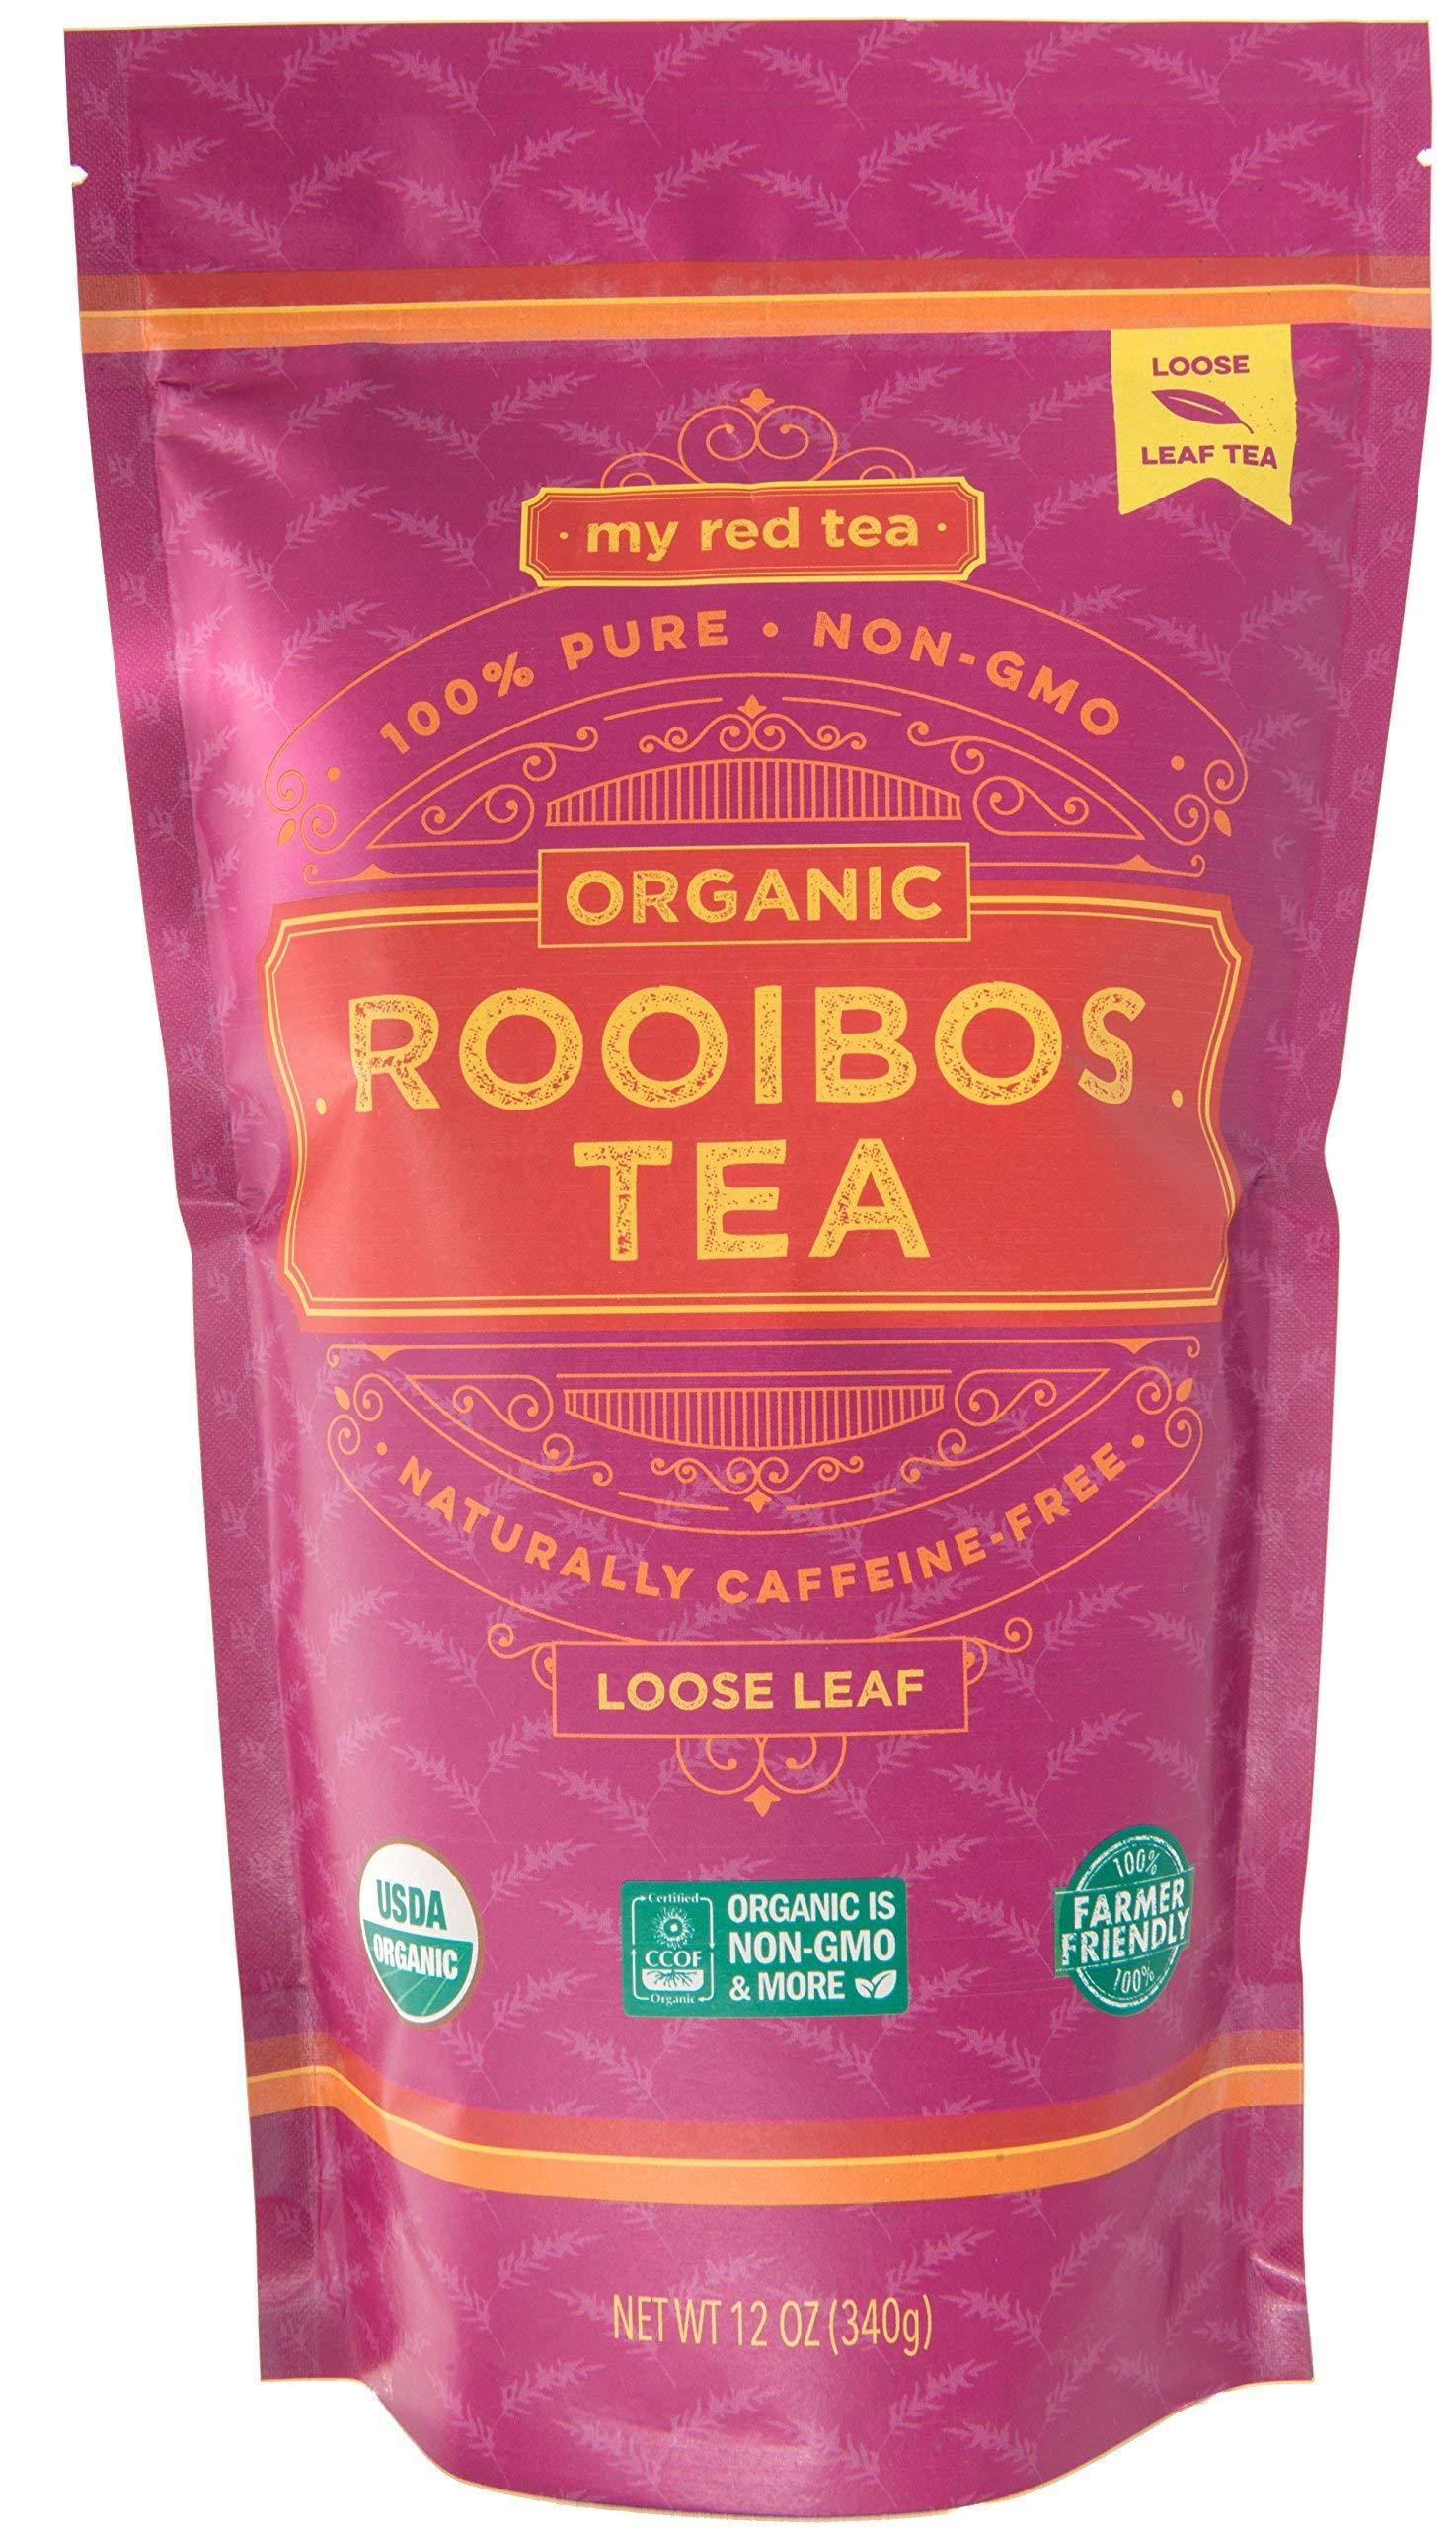 Rooibos Tea, USDA Certified Organic Tea, MY RED TEA. Loose Tea. South African, 100% Pure, Single Origin, Natural, Farmer Friendly, GMO and Caffeine Free (12oz Loose)